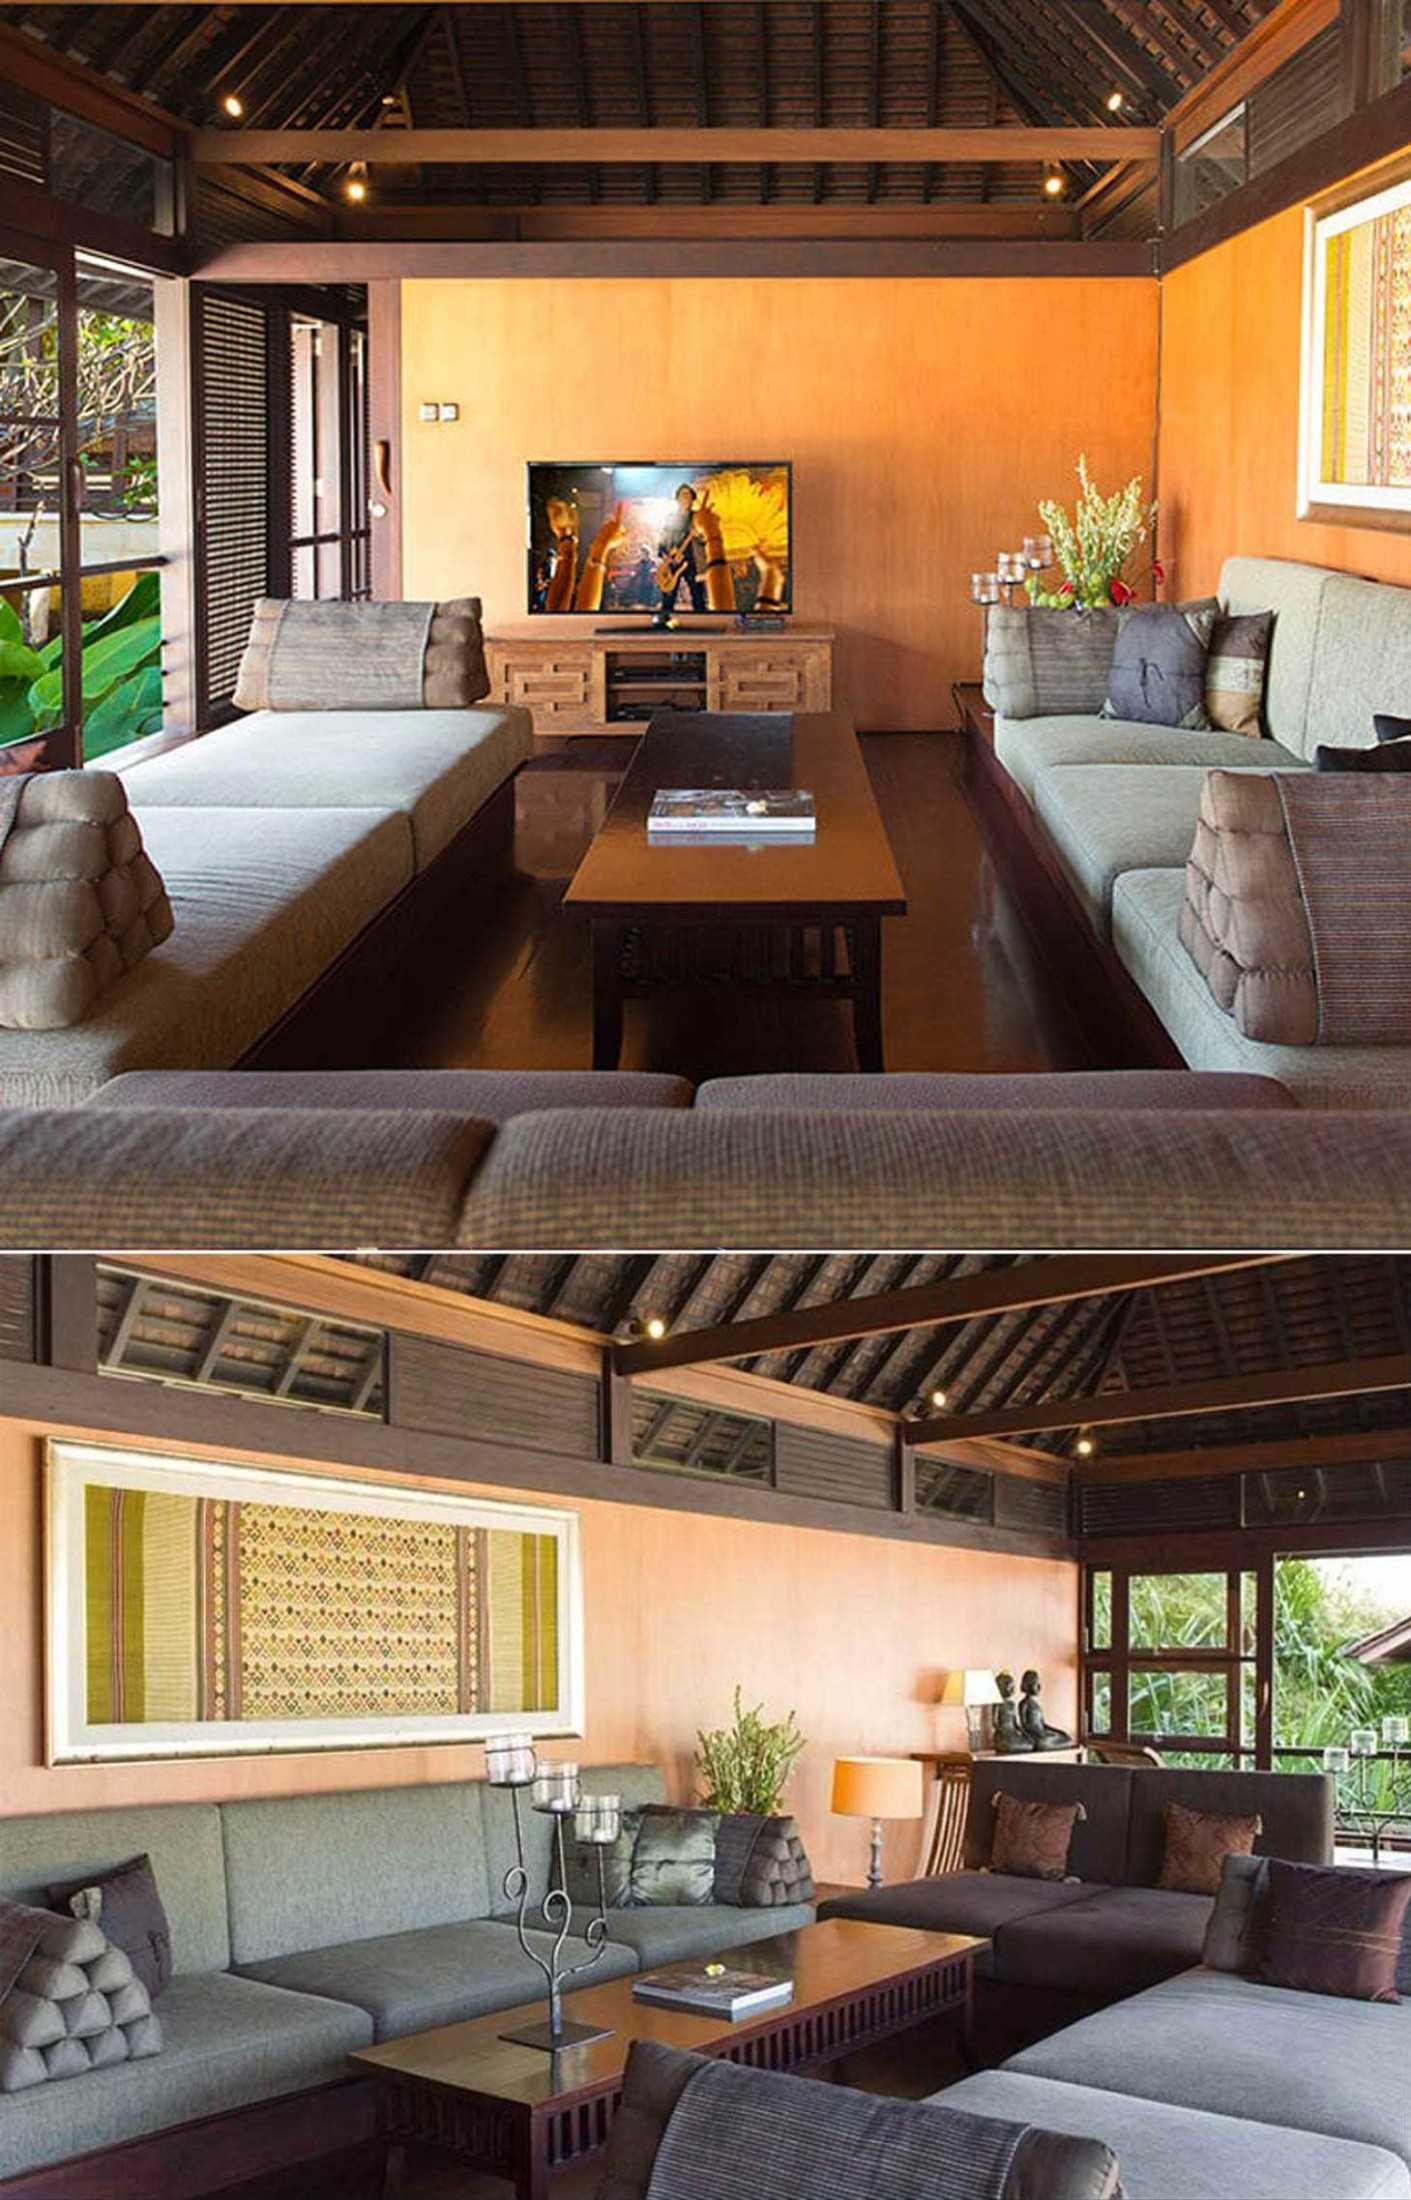 Agung Budi Raharsa | Architecture & Engineering Bayu Gita Residence - Bali Bali, Indonesia Bali, Indonesia Agung-Budi-Raharsa-Bayu-Gita-Residence  88479